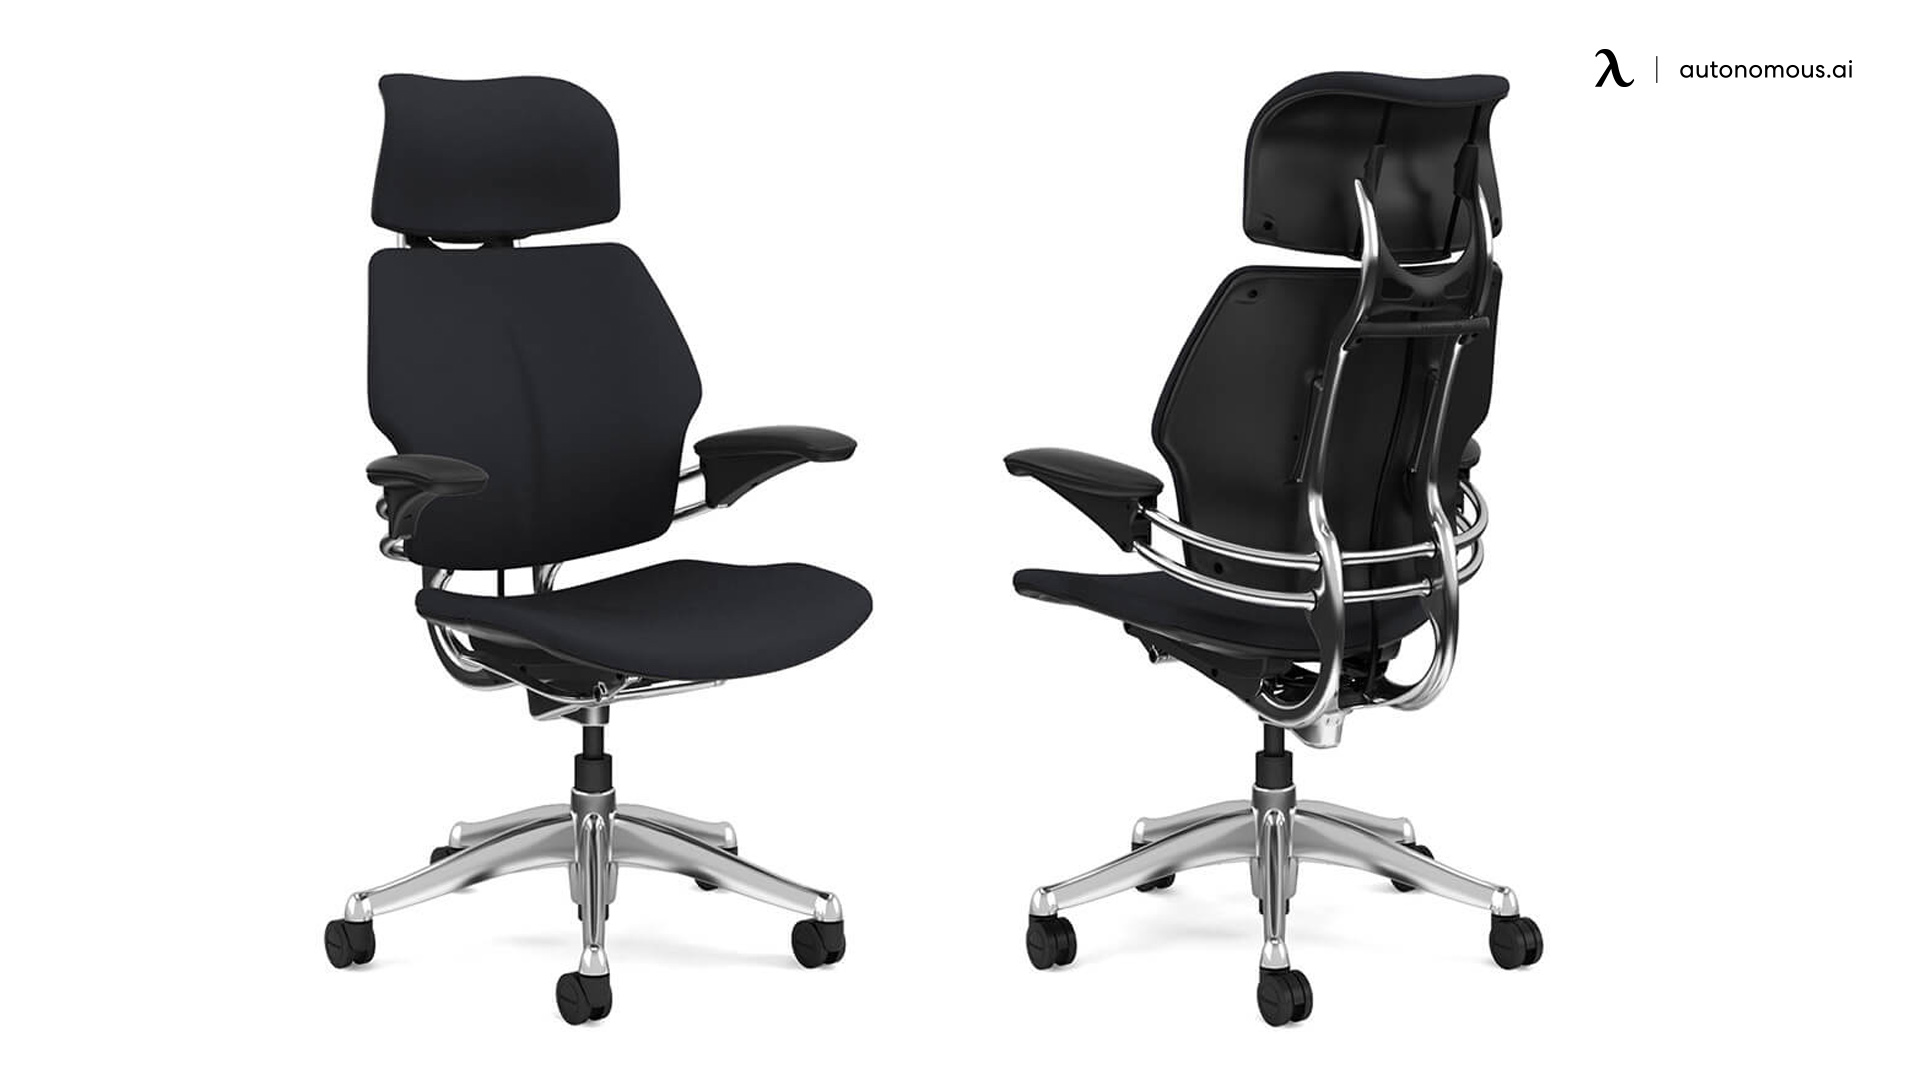 HumanScale Freedom Ergonomic Office Chair